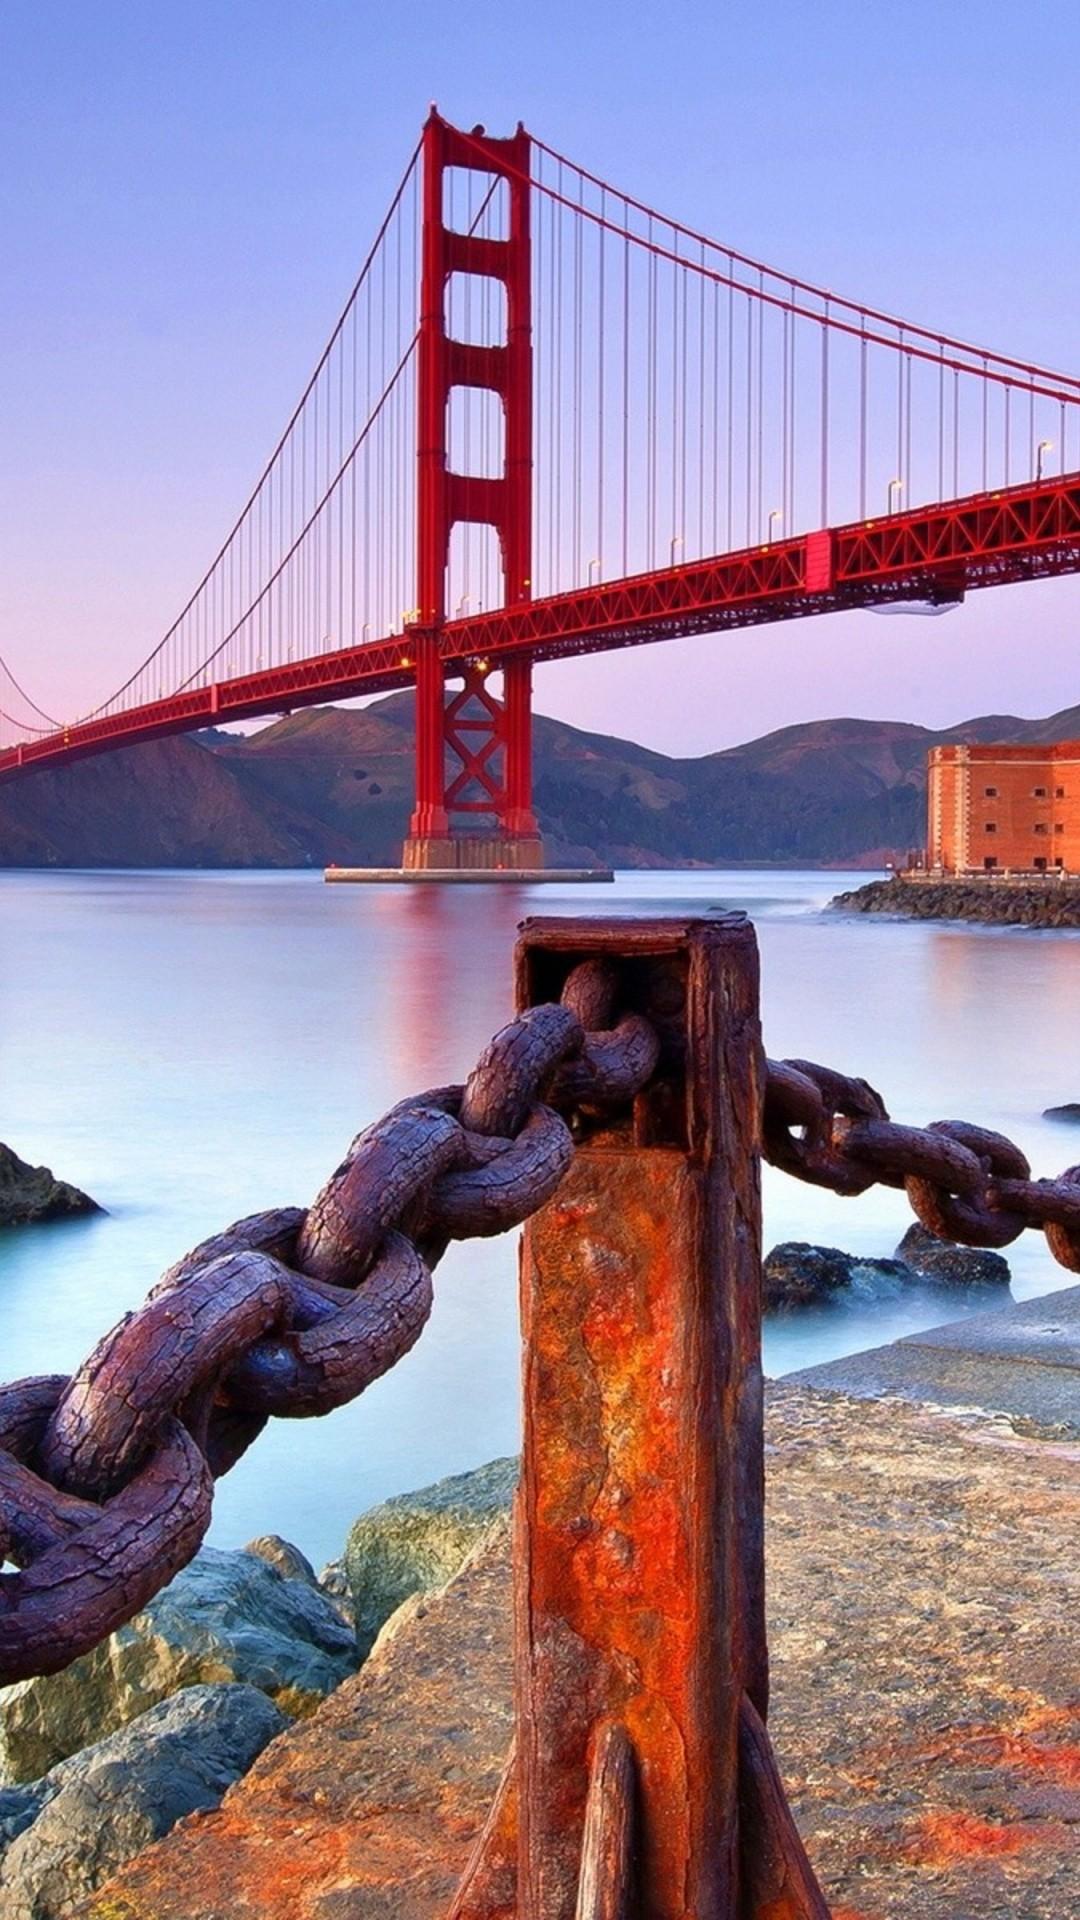 Golden Gate Bridge iphone home screen wallpaper